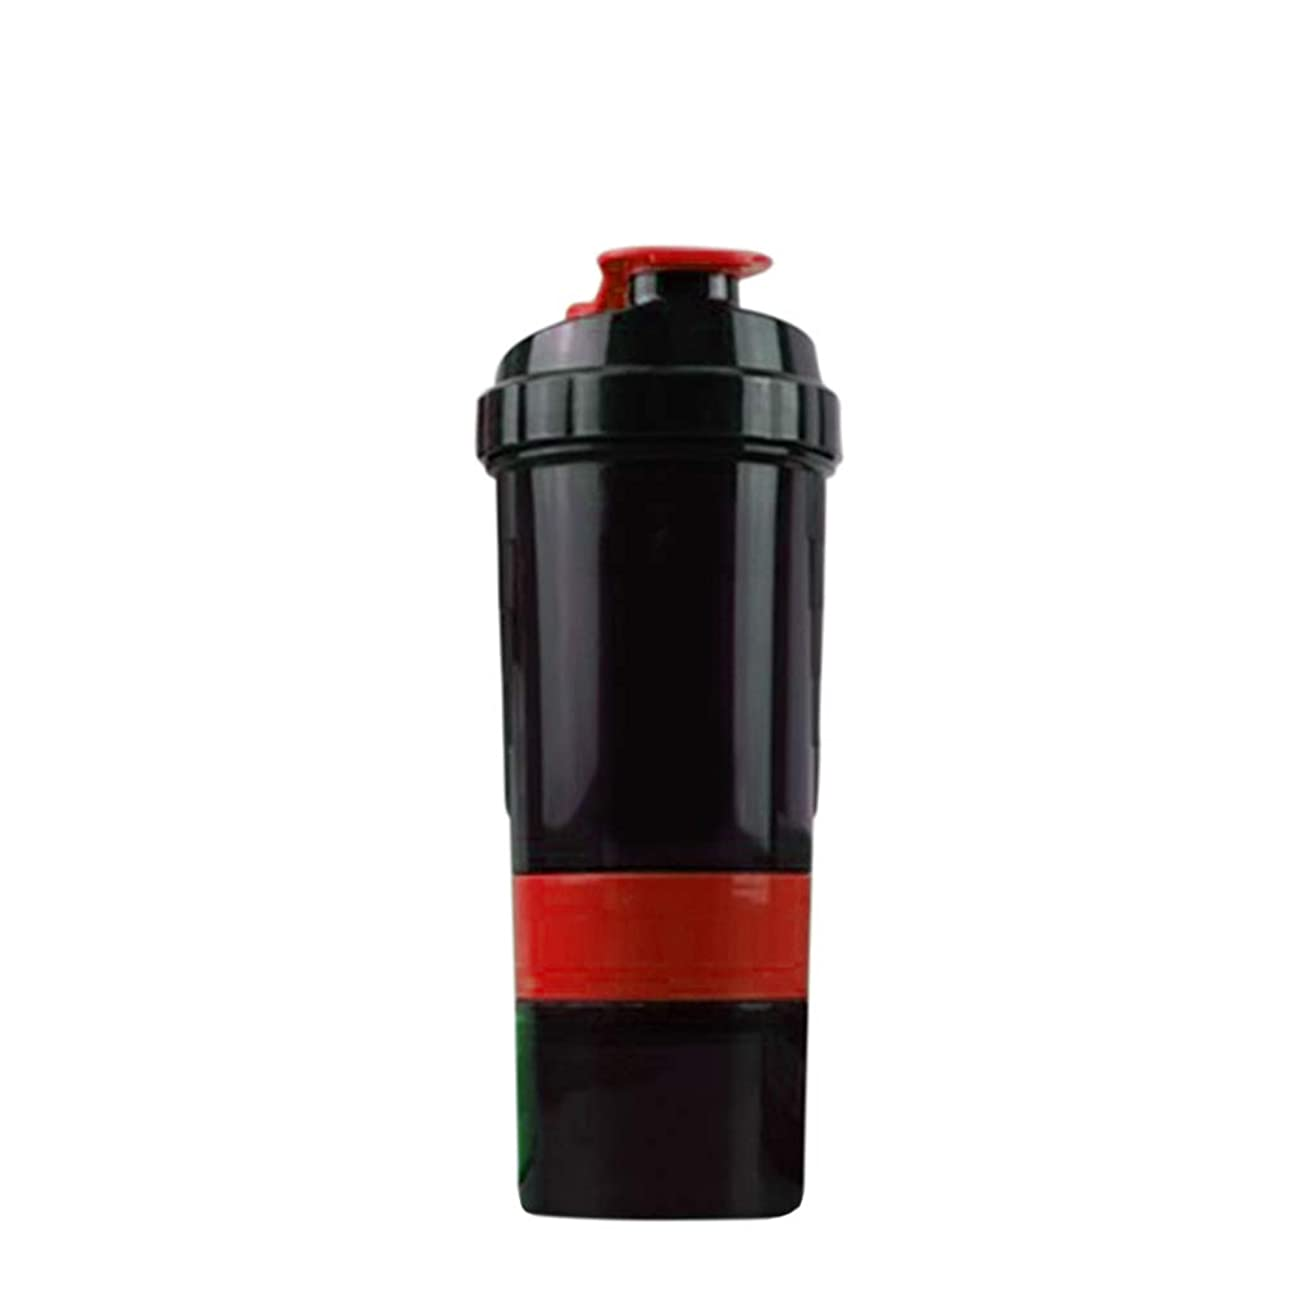 【LORIA?JP品】 Pro プロテインシェイカー 500ml 多機能 シェーカーボトル レッド